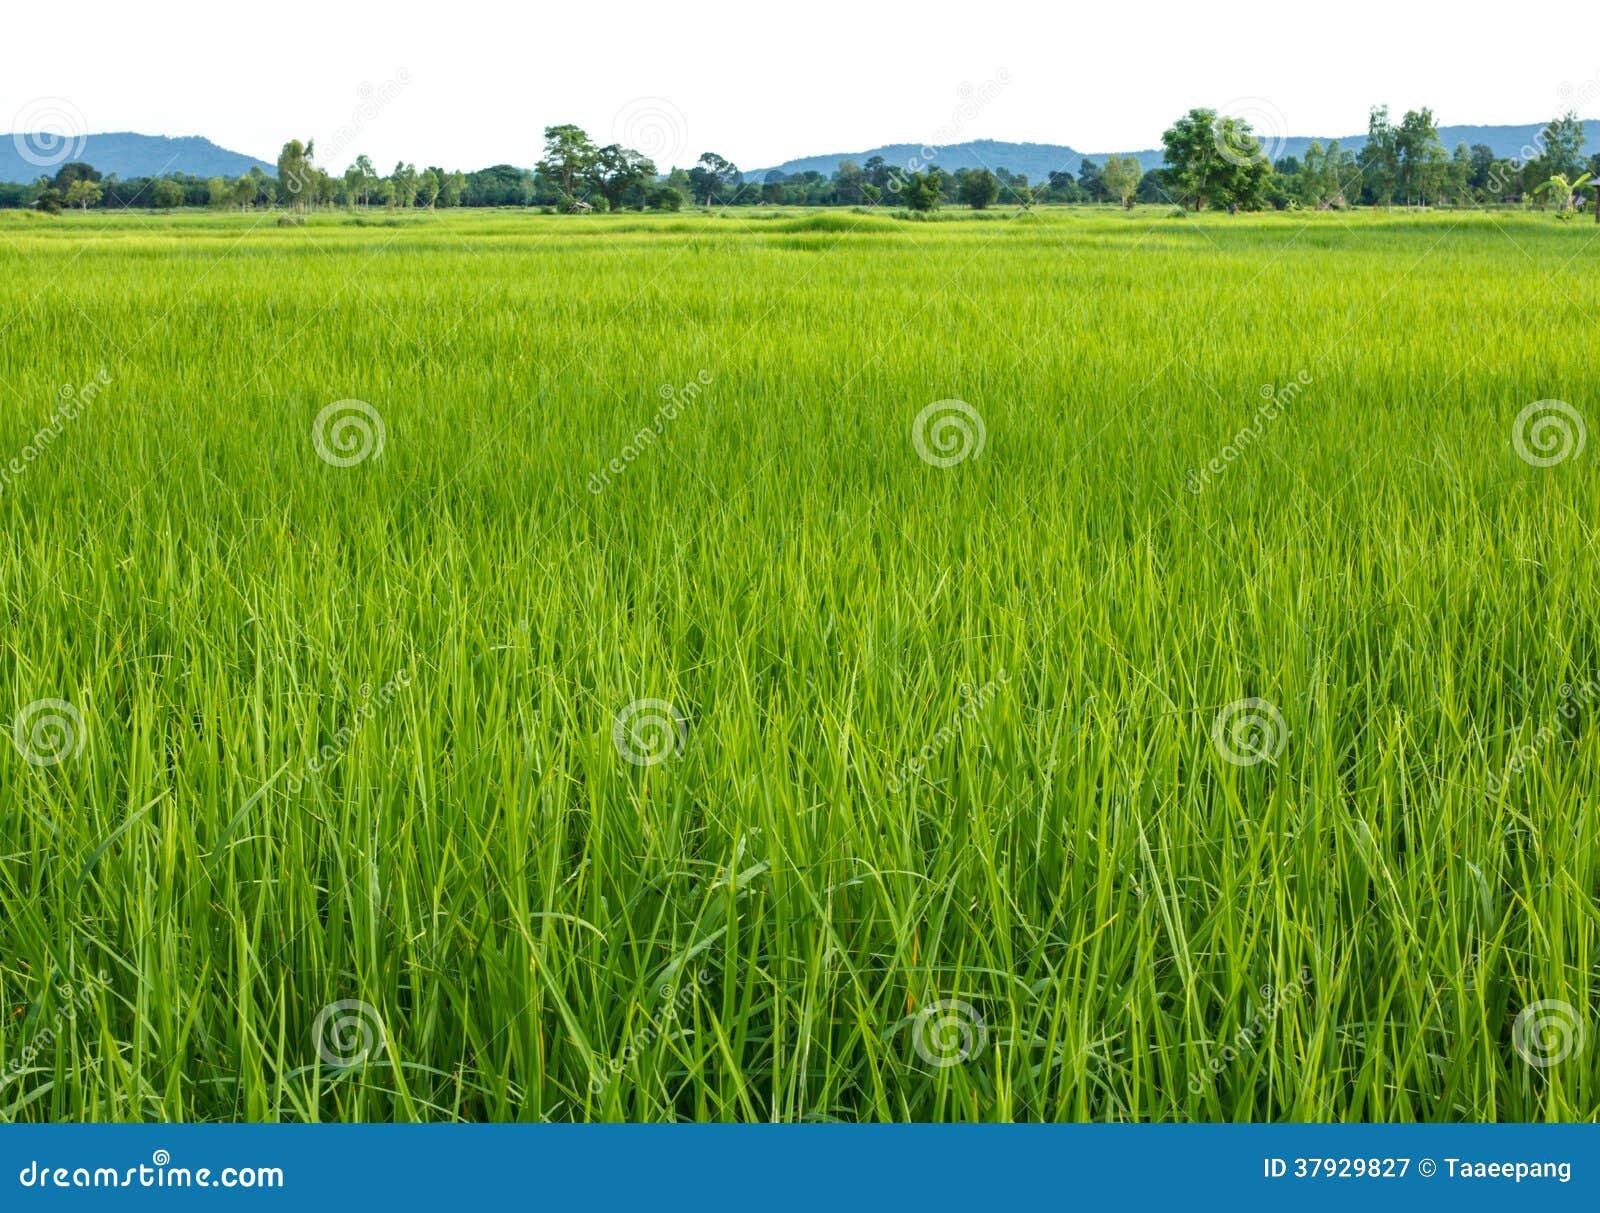 Культивирование риса